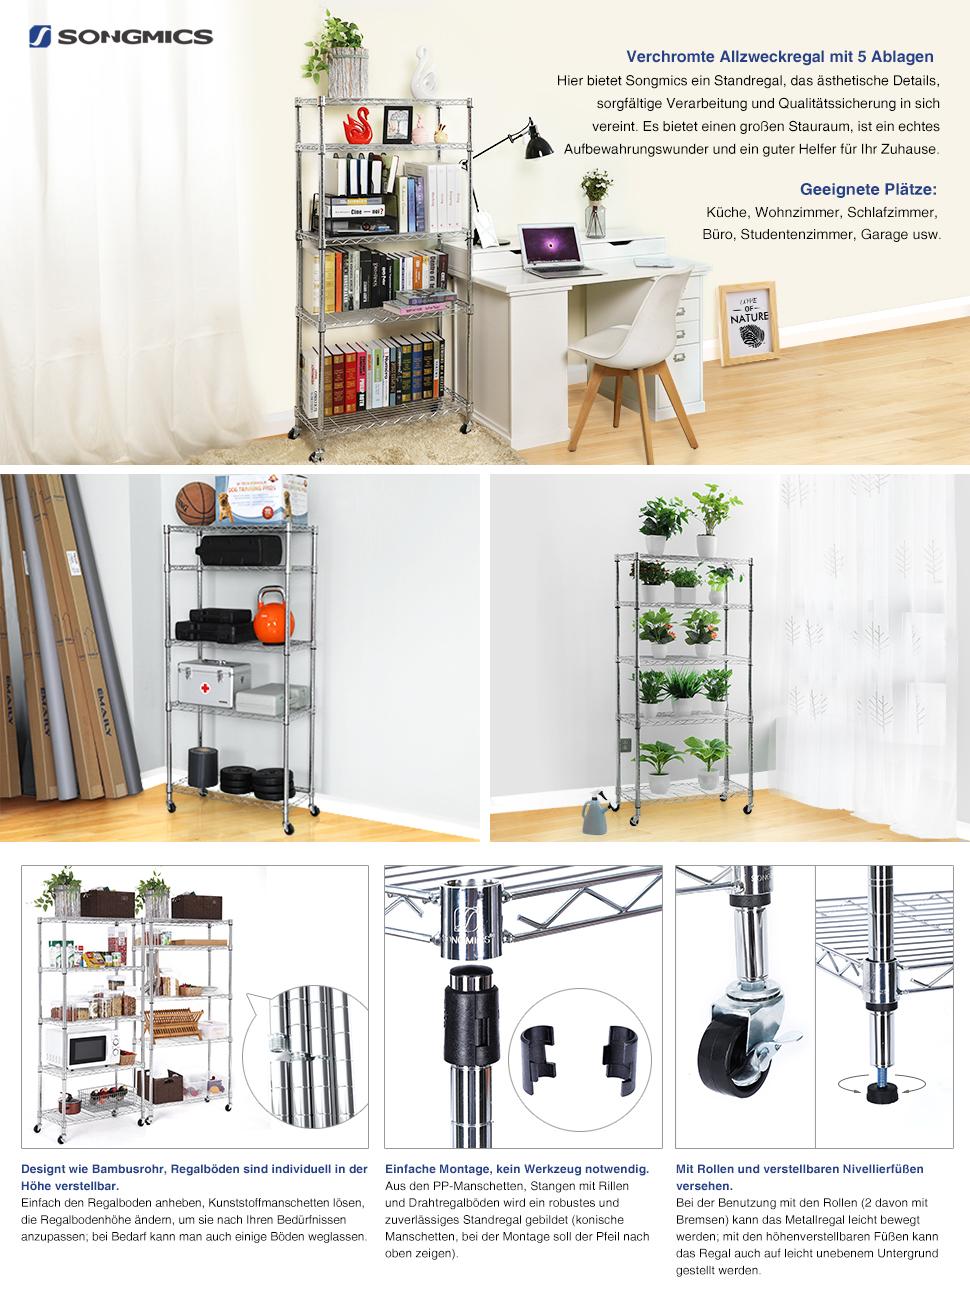 Amazon.de: SONGMICS Küchenregal Standregal mit 5 Regalböden, Super ...